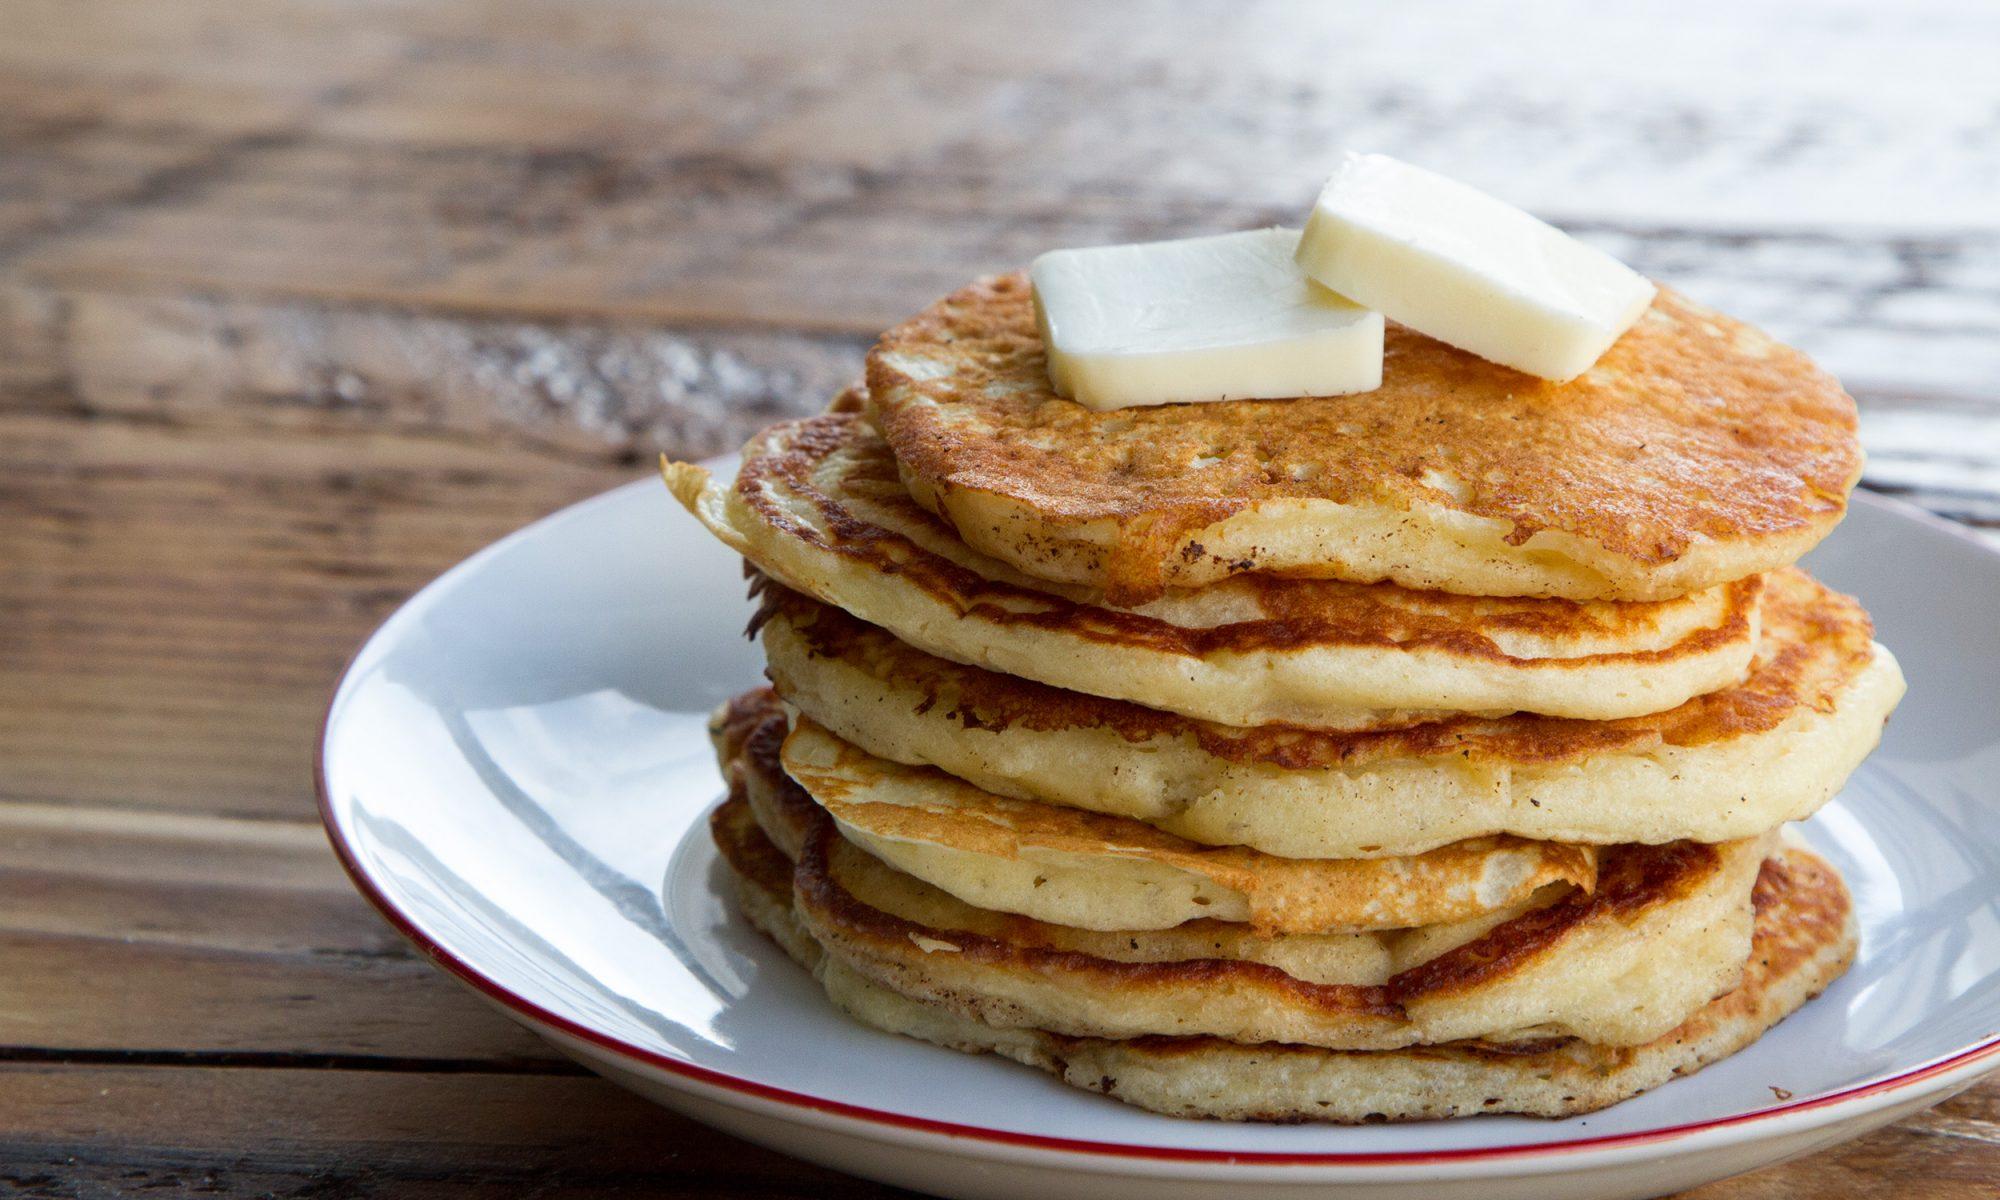 Make Extra-Golden-Brown Pancakes with This Secret Ingredient